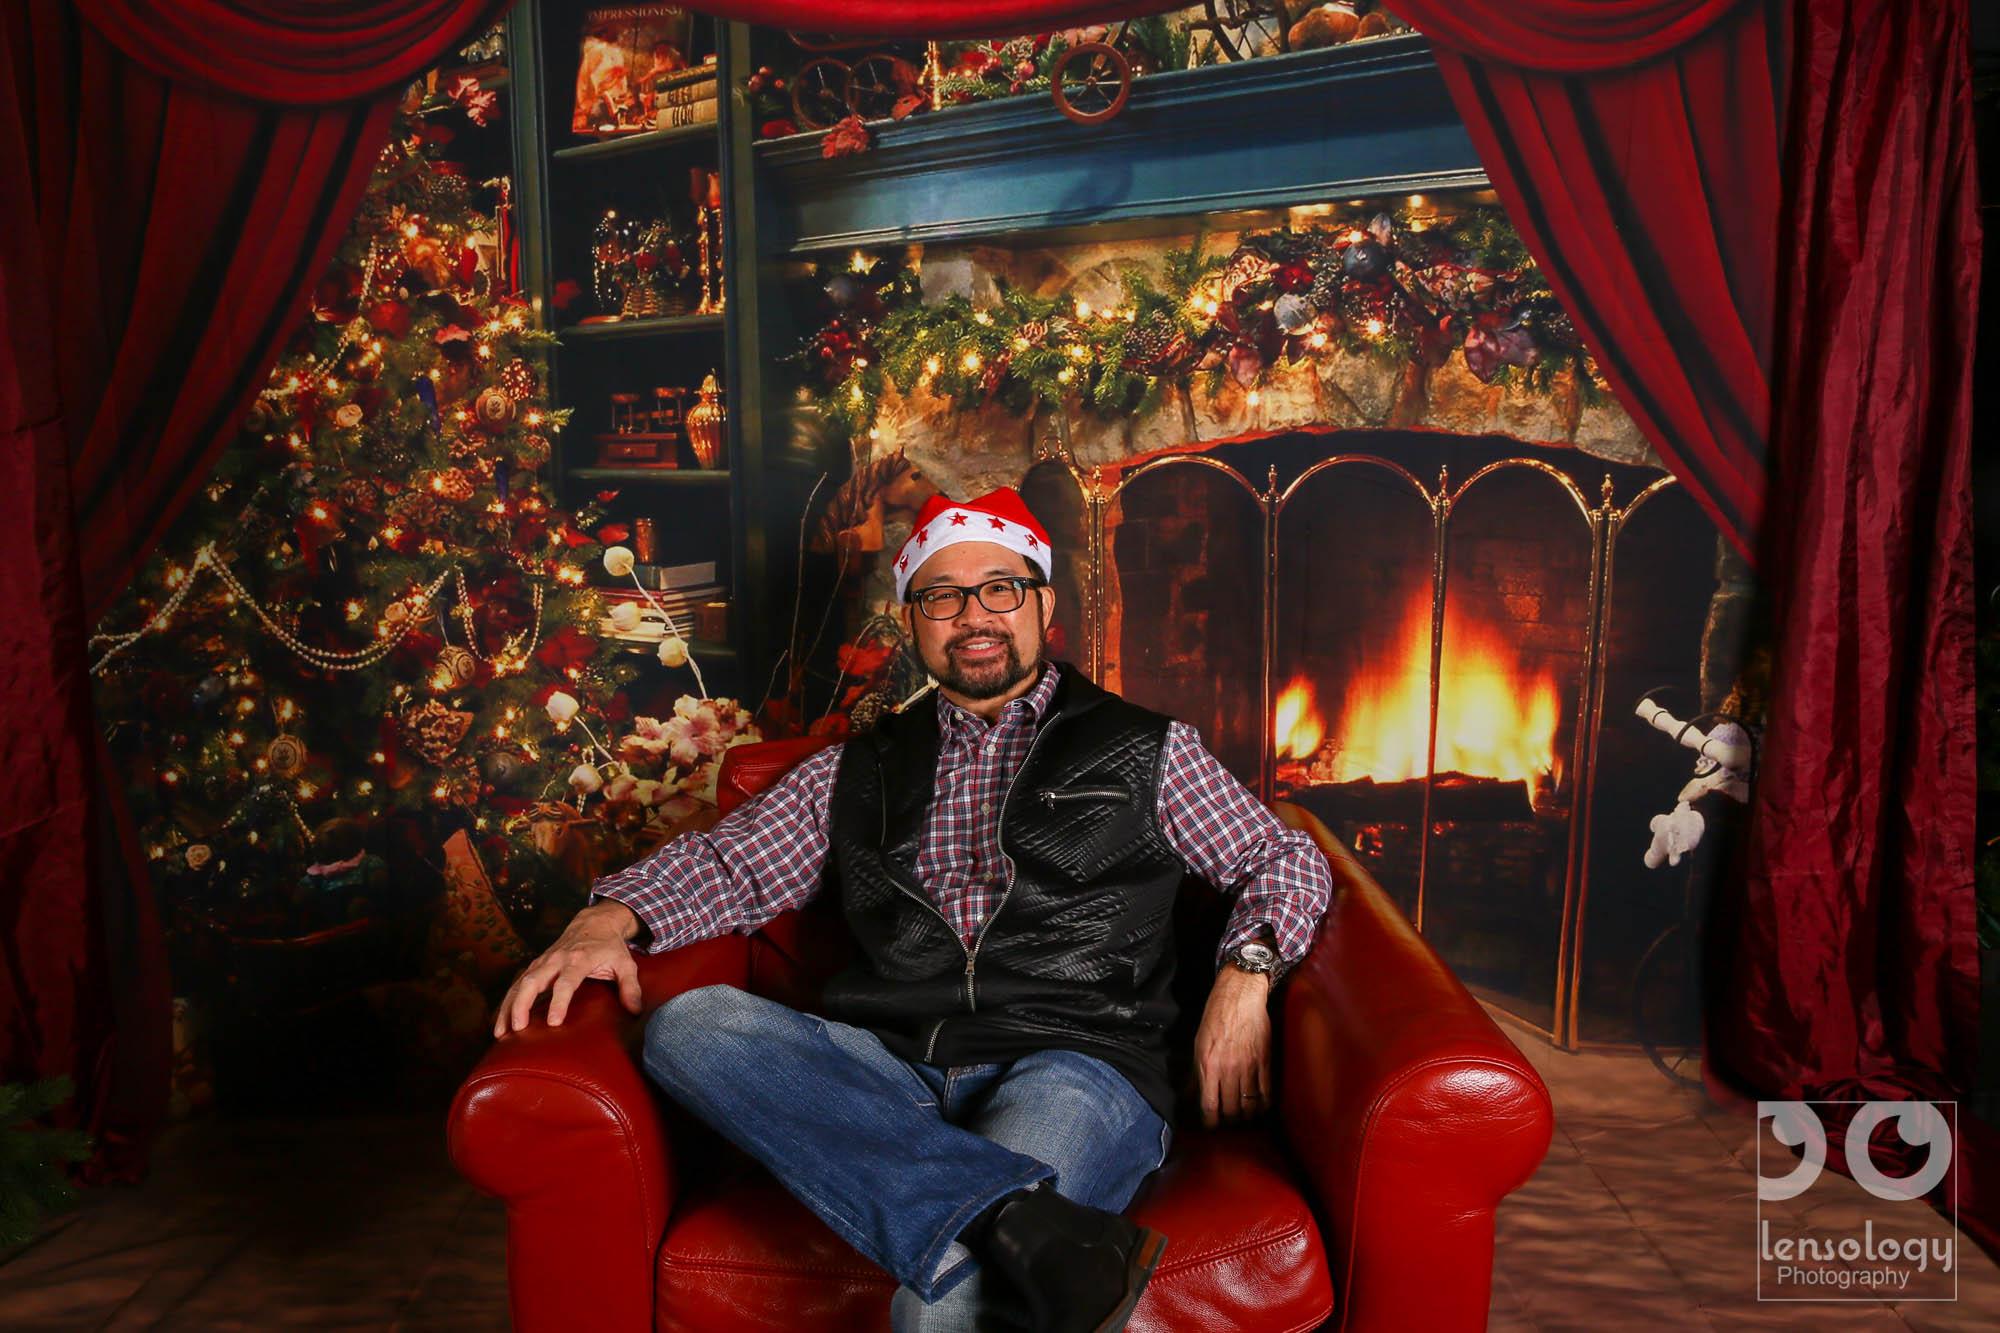 los Angeles Event Photographer